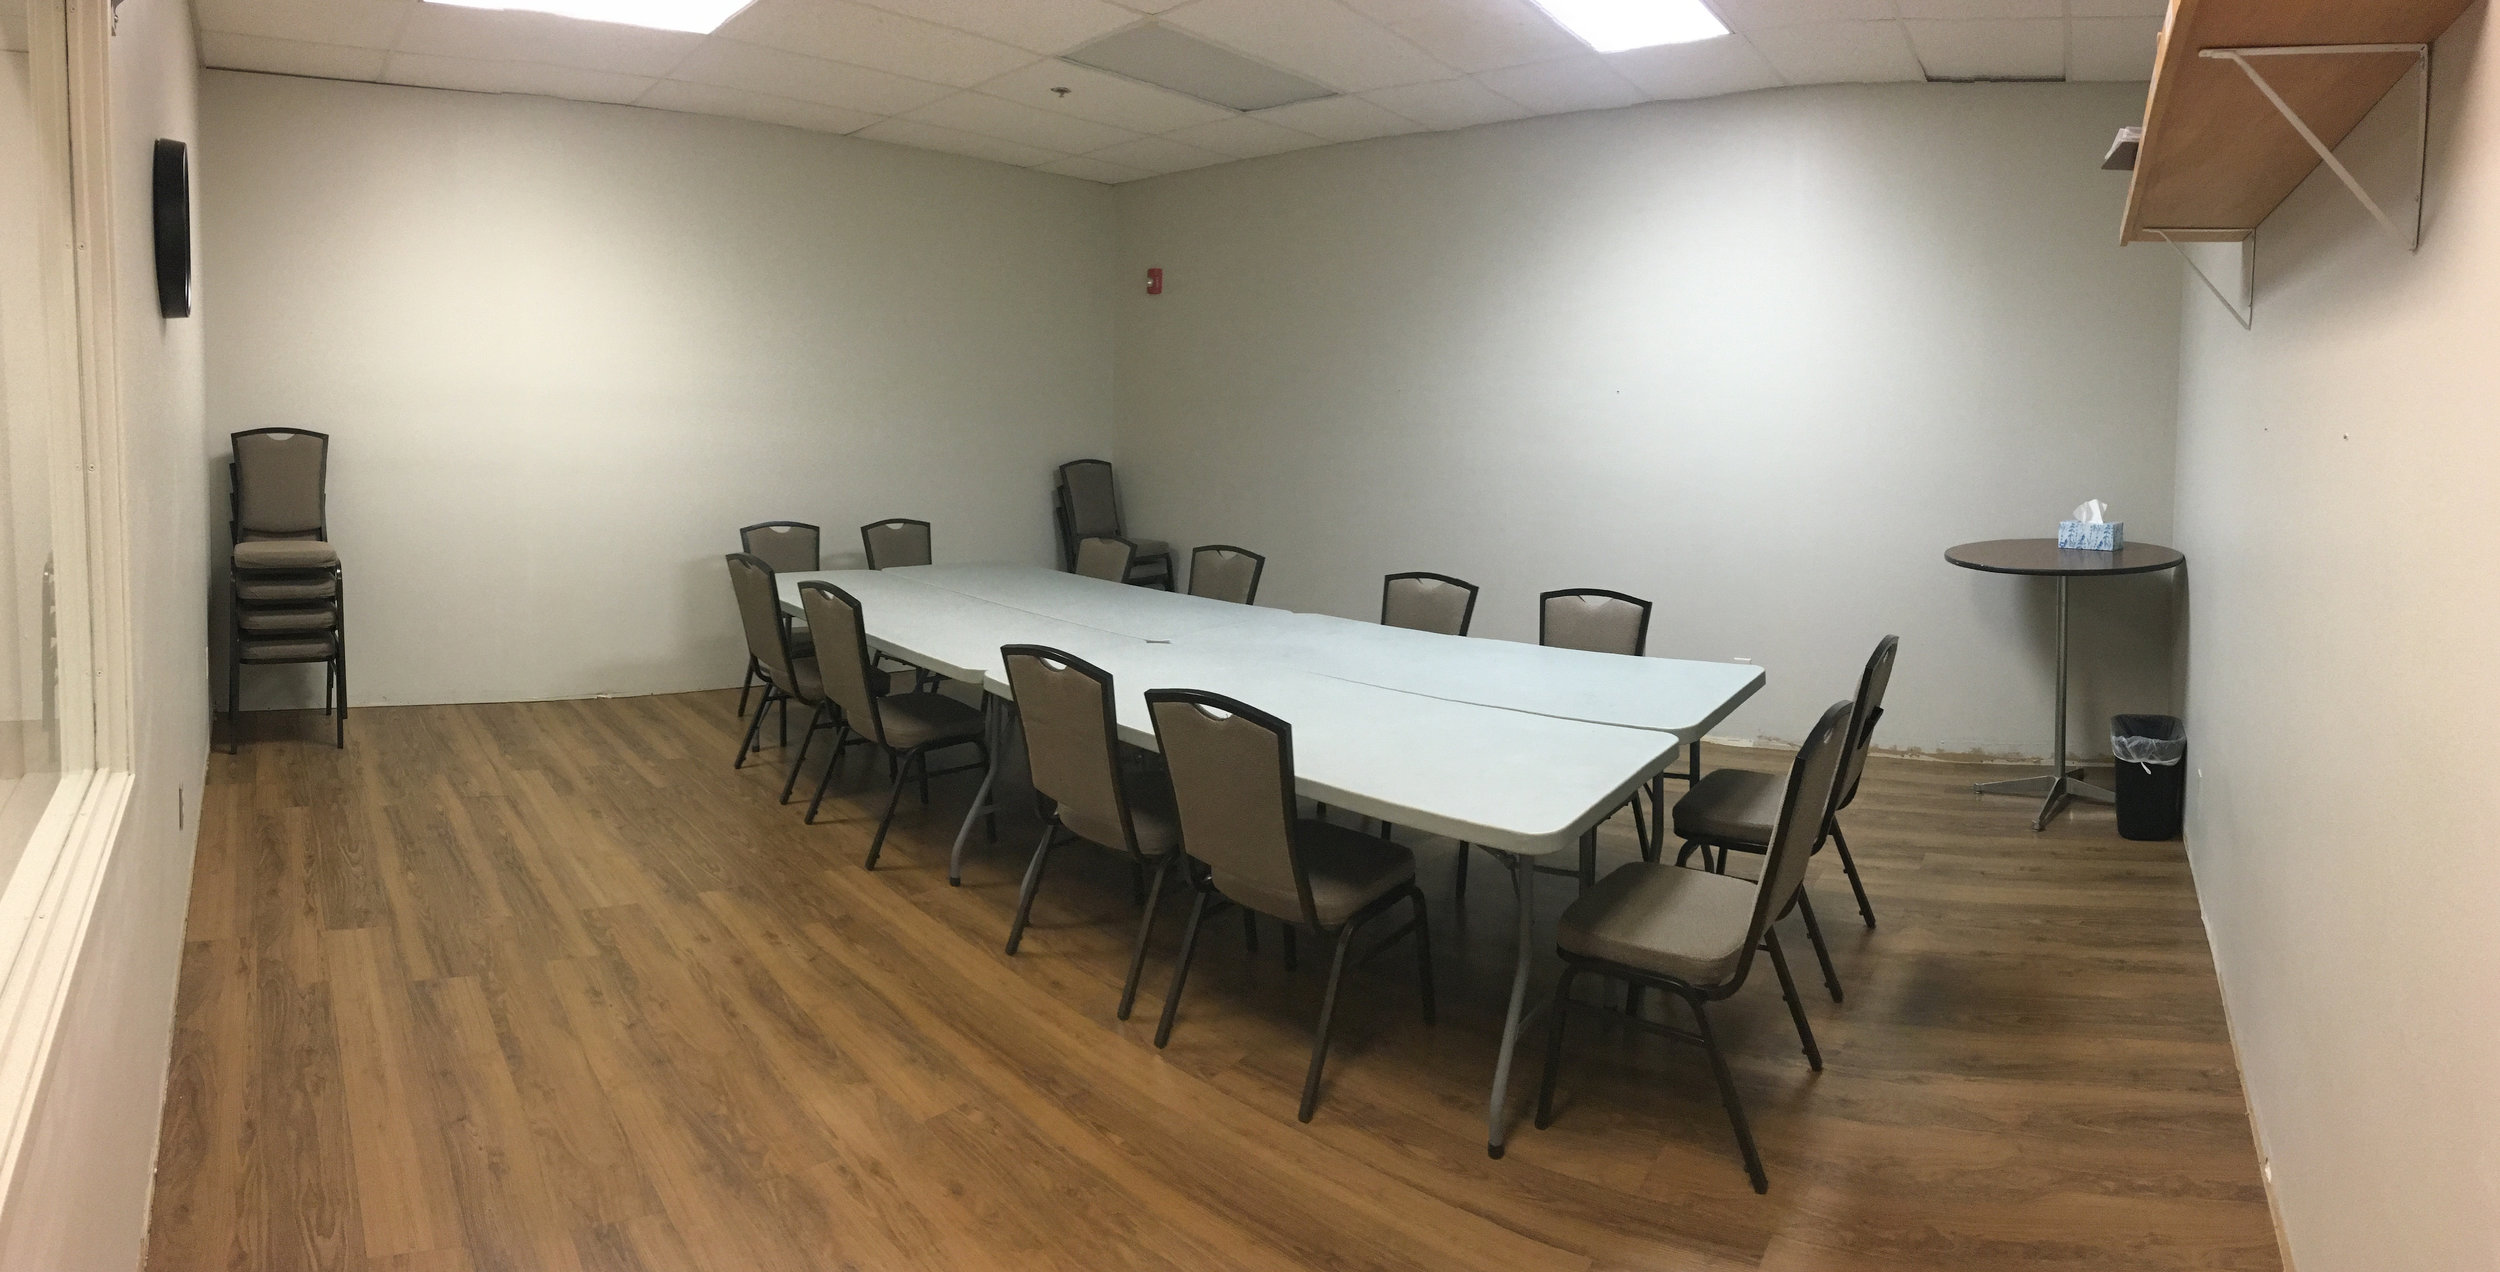 Meeting-Room-1-Frontcorner.JPG